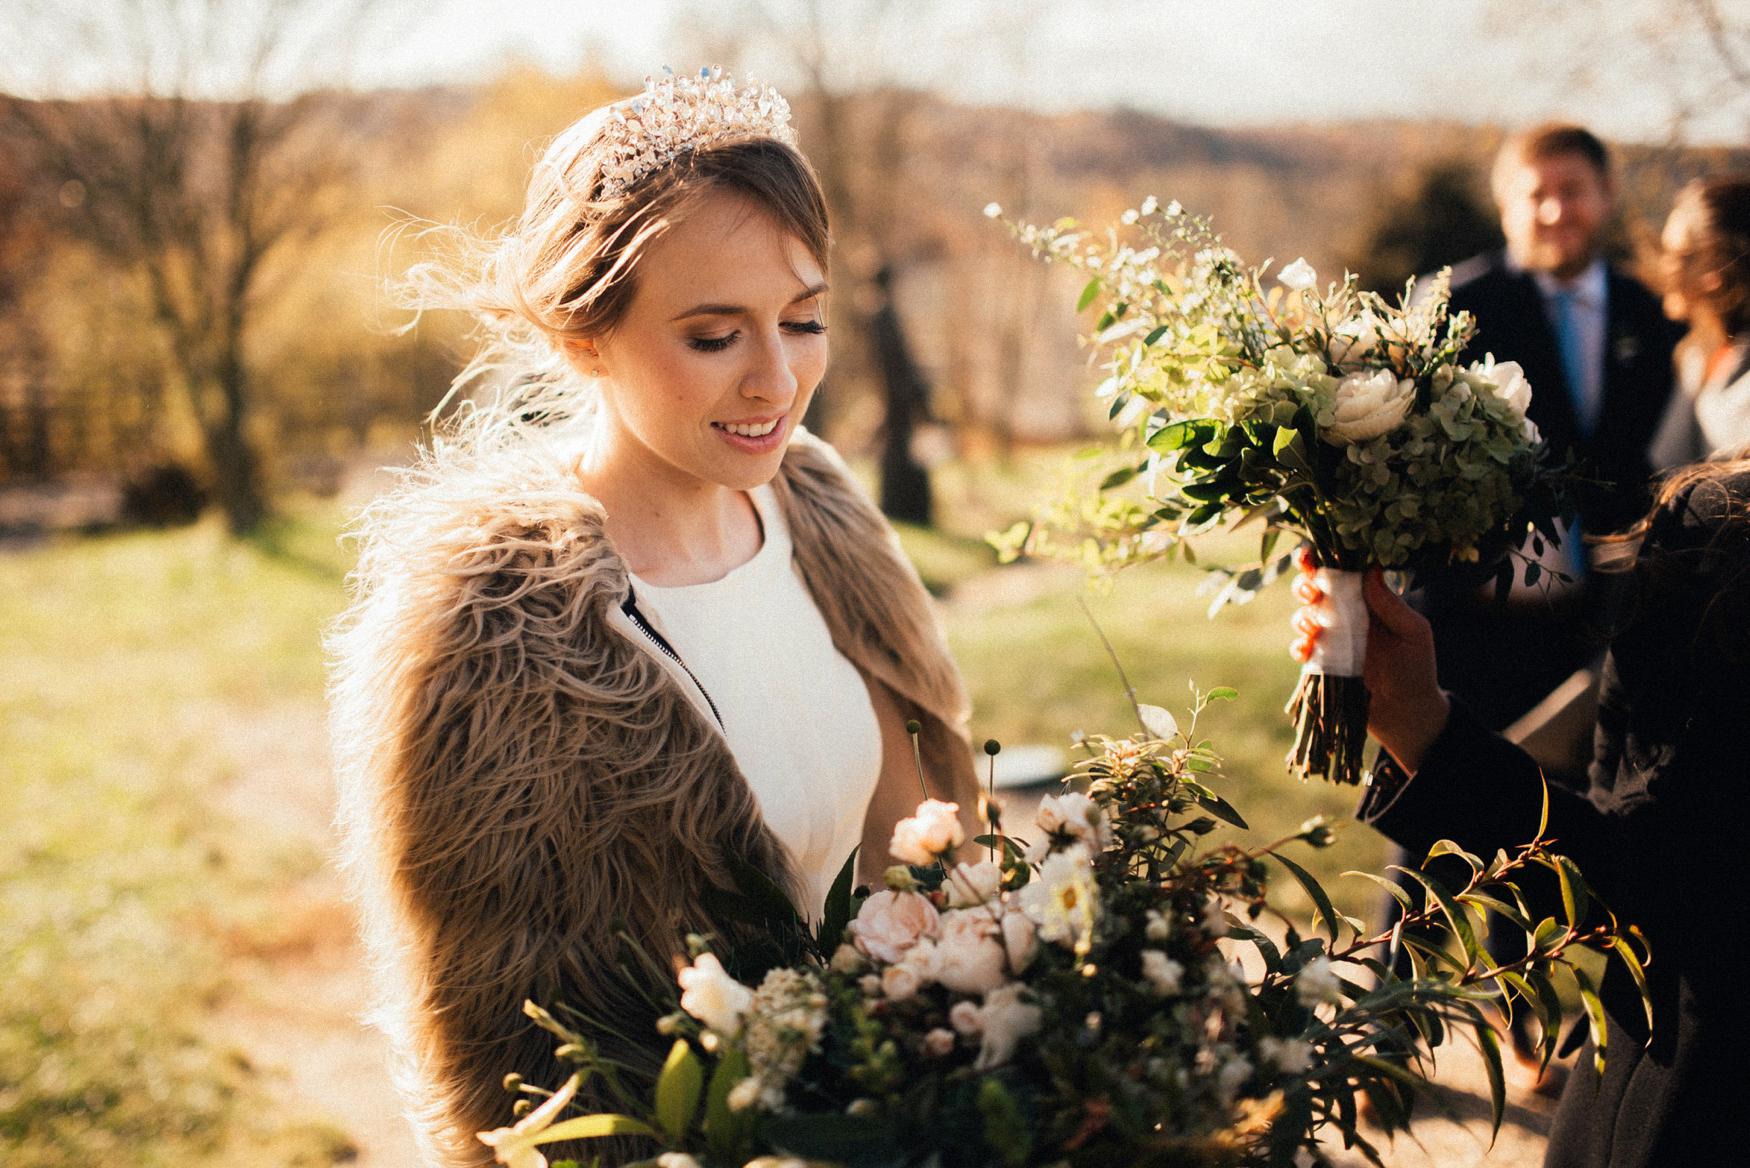 2 prague wedding photographer - boho svatba zikmundov006.jpg